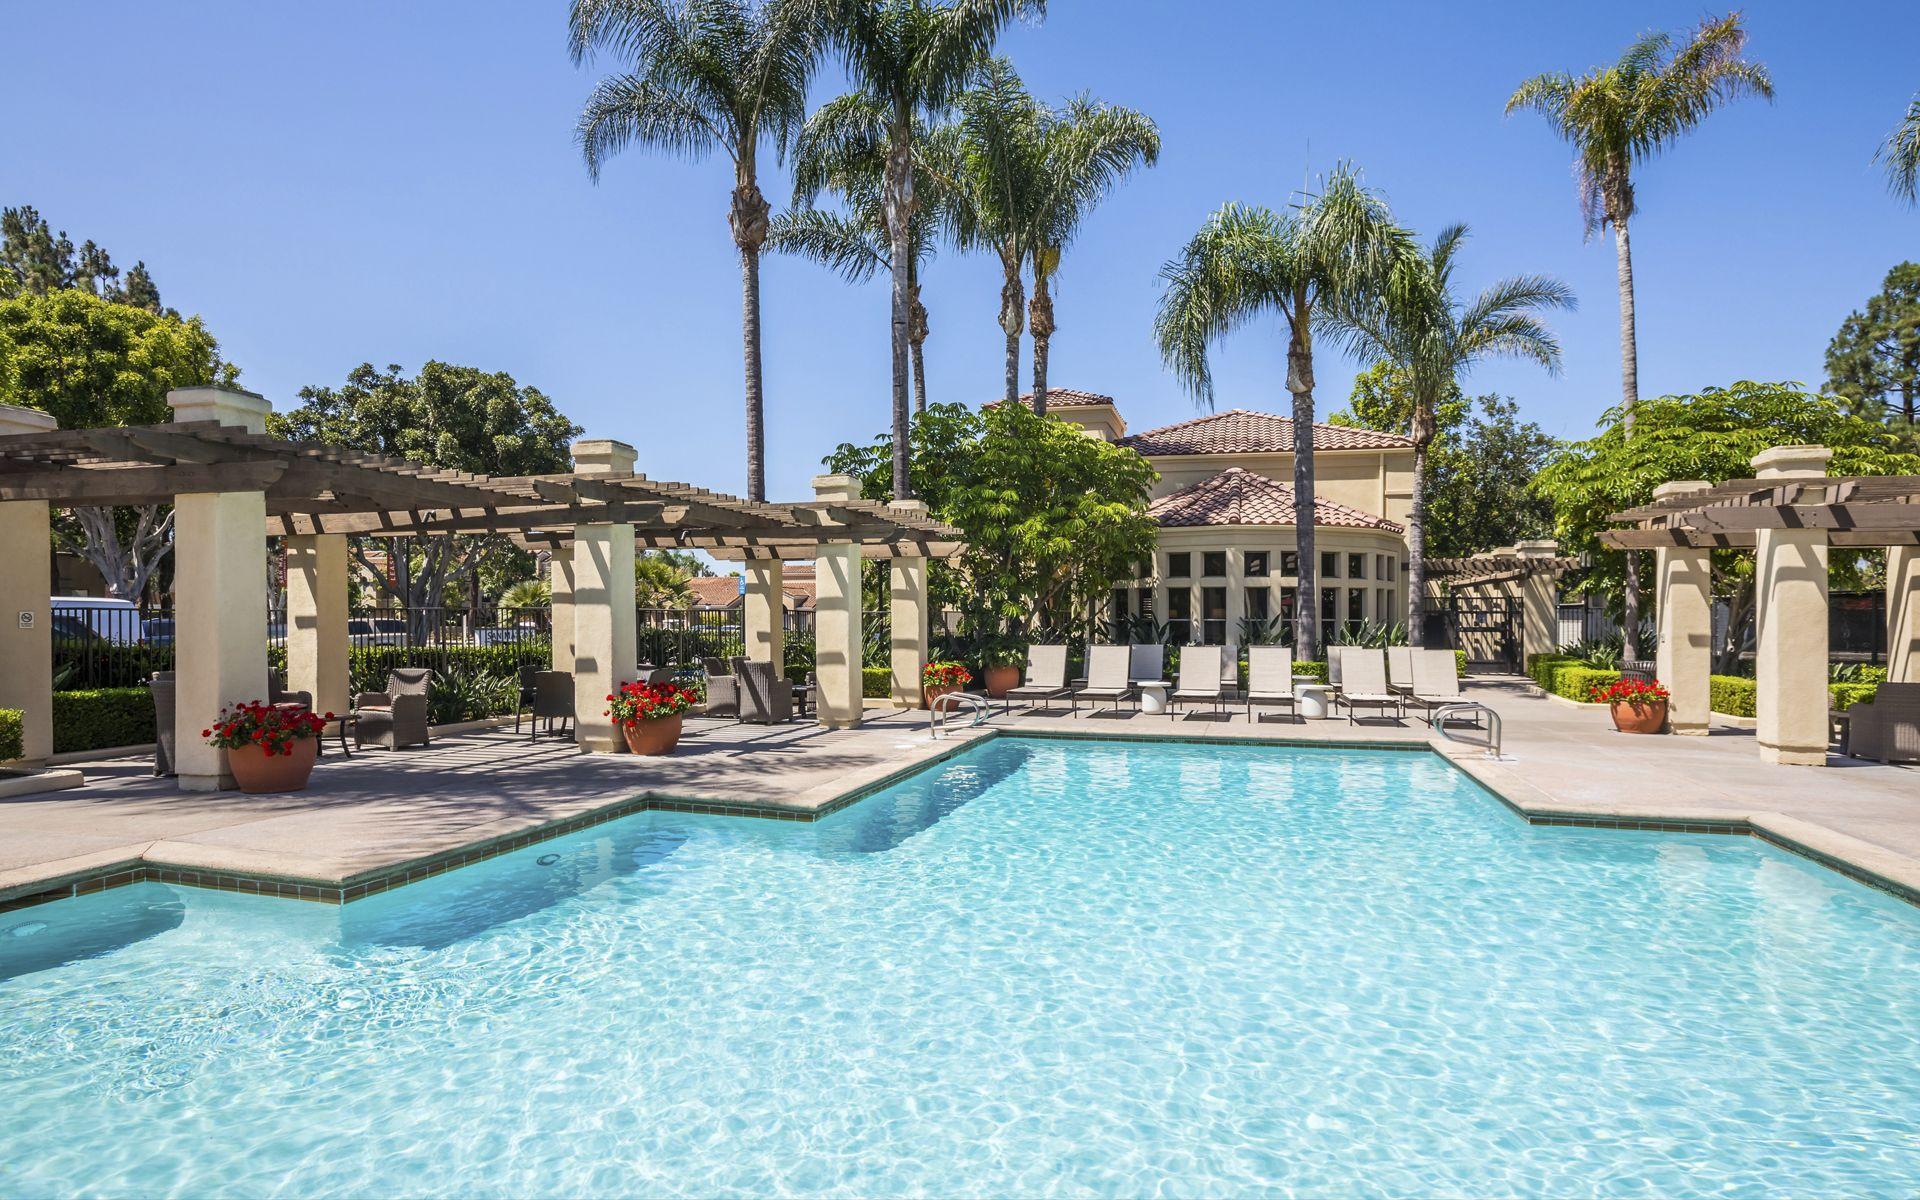 San Mateo Apartments in Irvine - 1 - 3 Bedroom & Studios